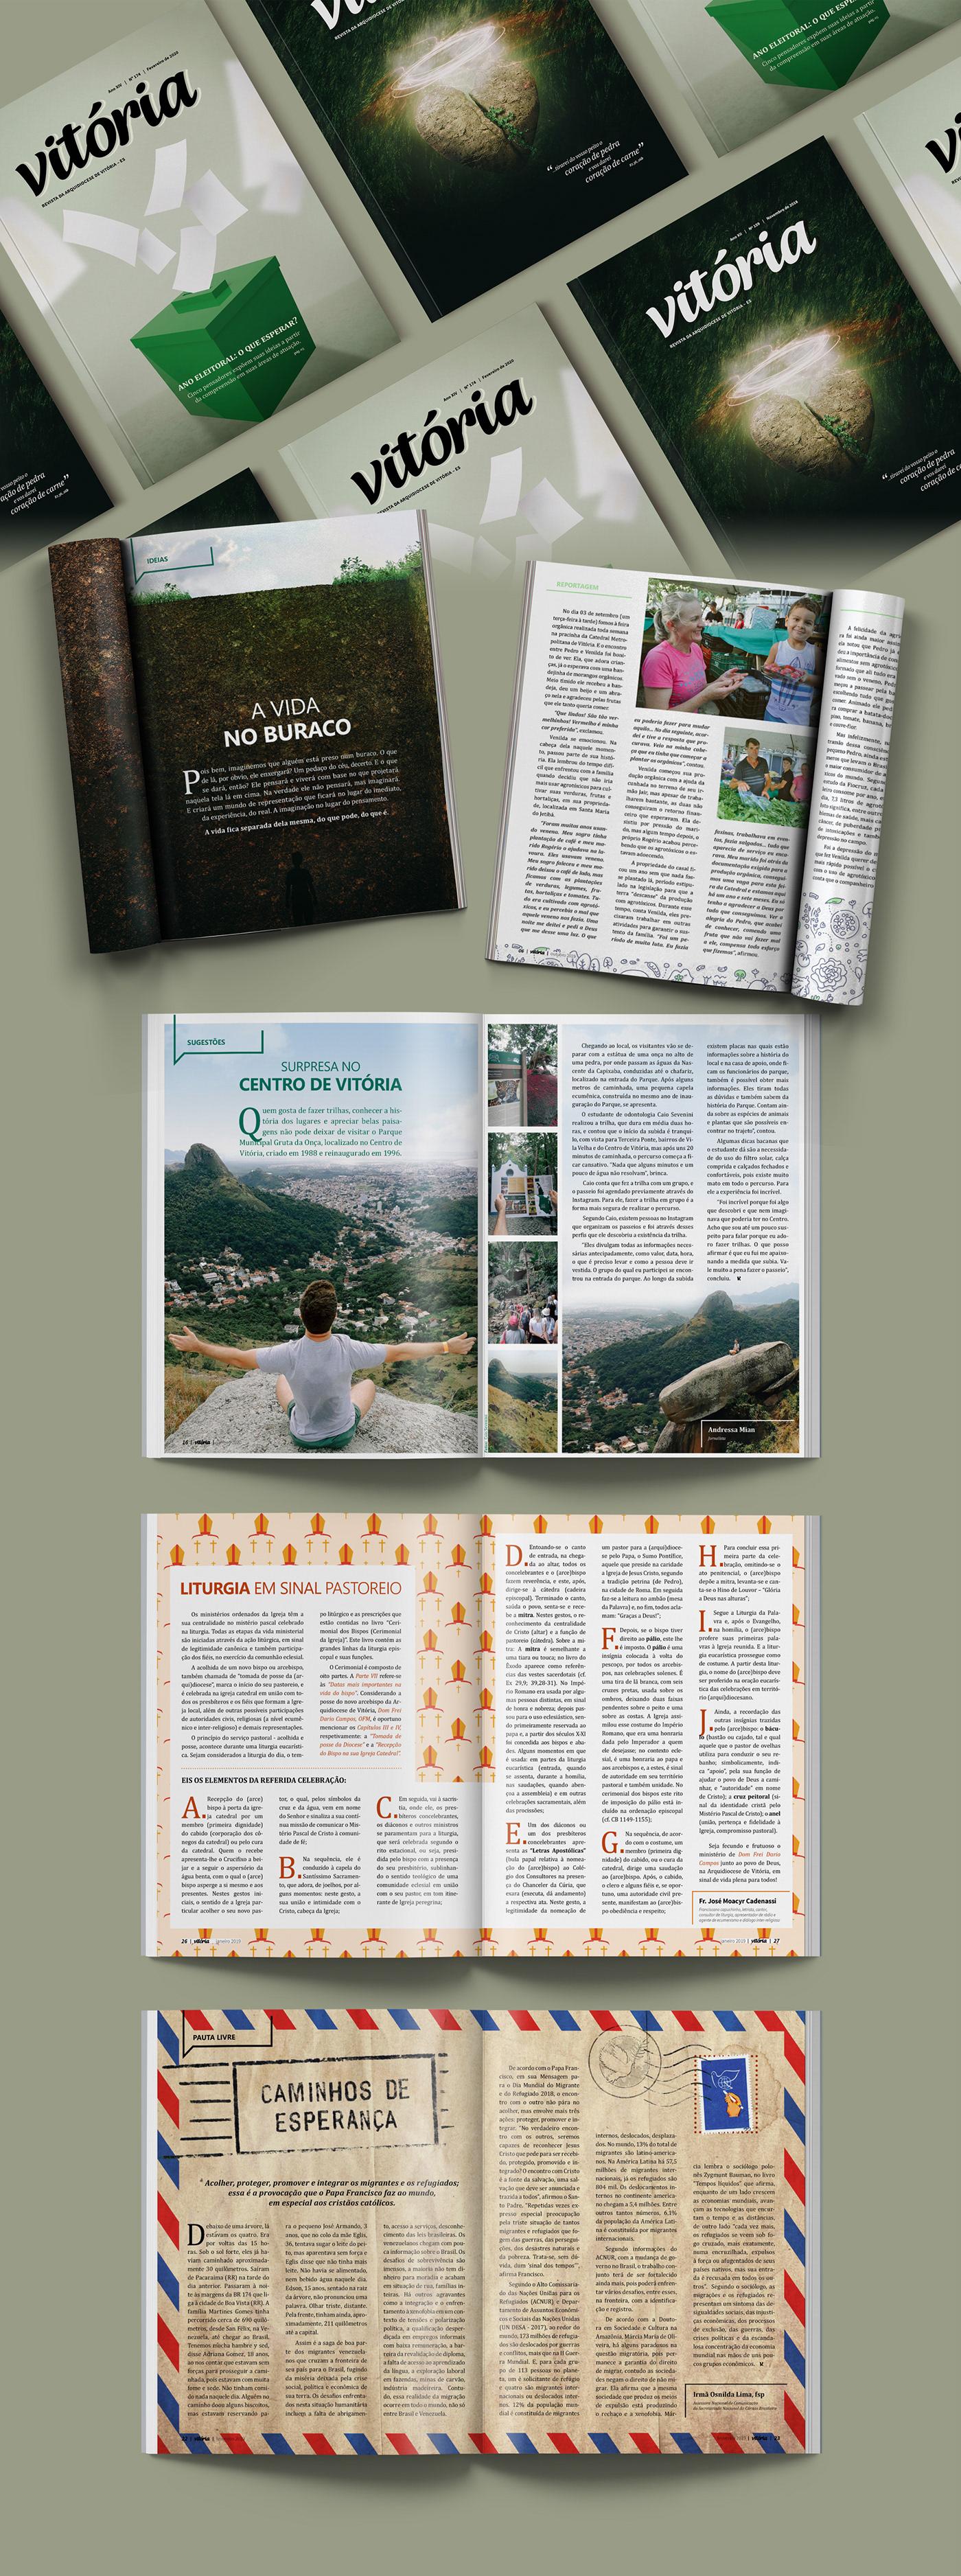 church diagramação InDesign magazine Mitra Paulo Arrivabene pauloarrivabene revista Vitoria